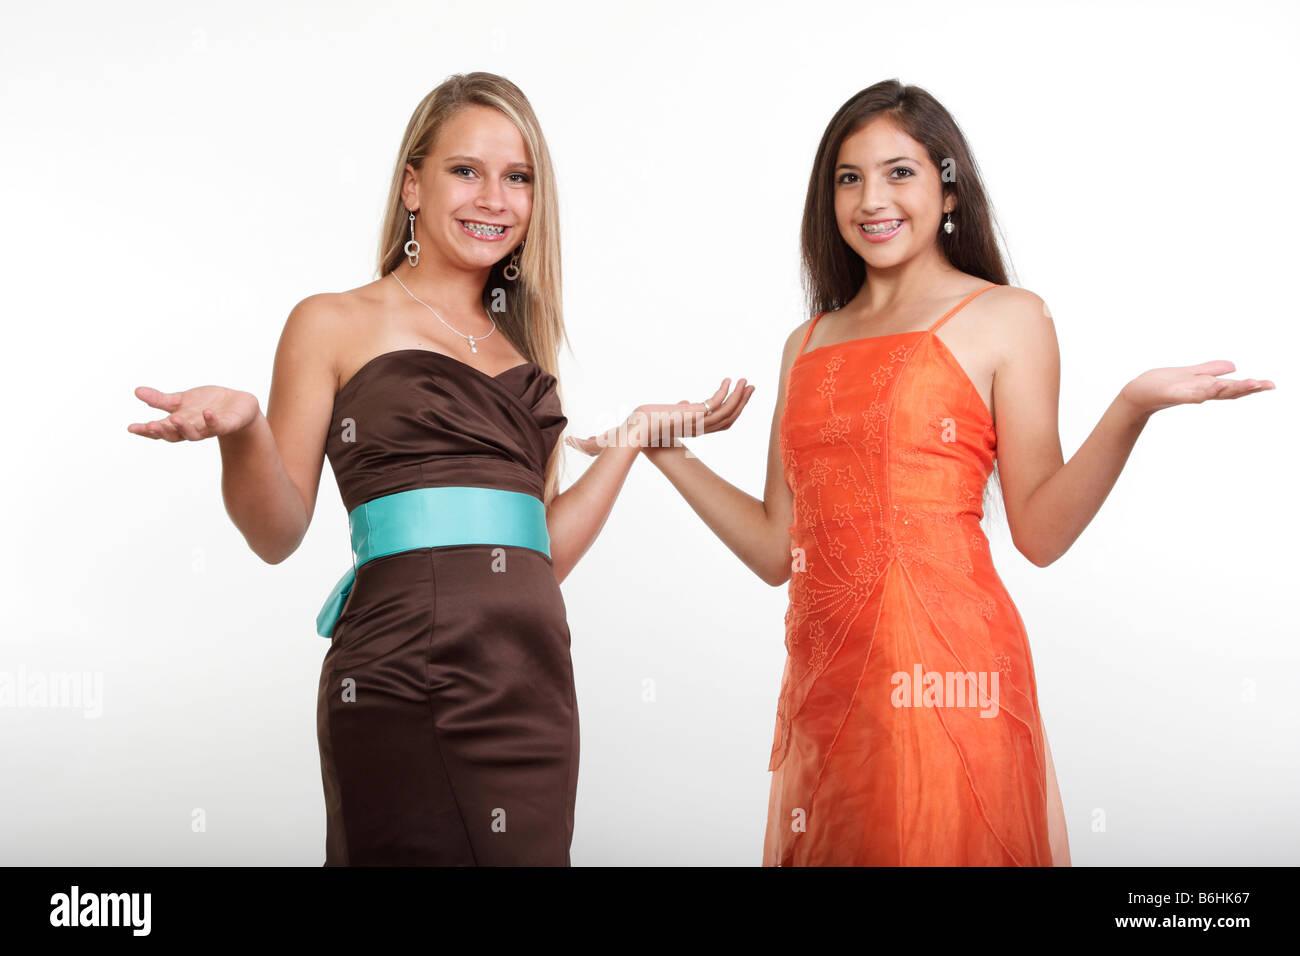 Two teen girls in prom dresses having fun Stock Photo: 21286559 - Alamy